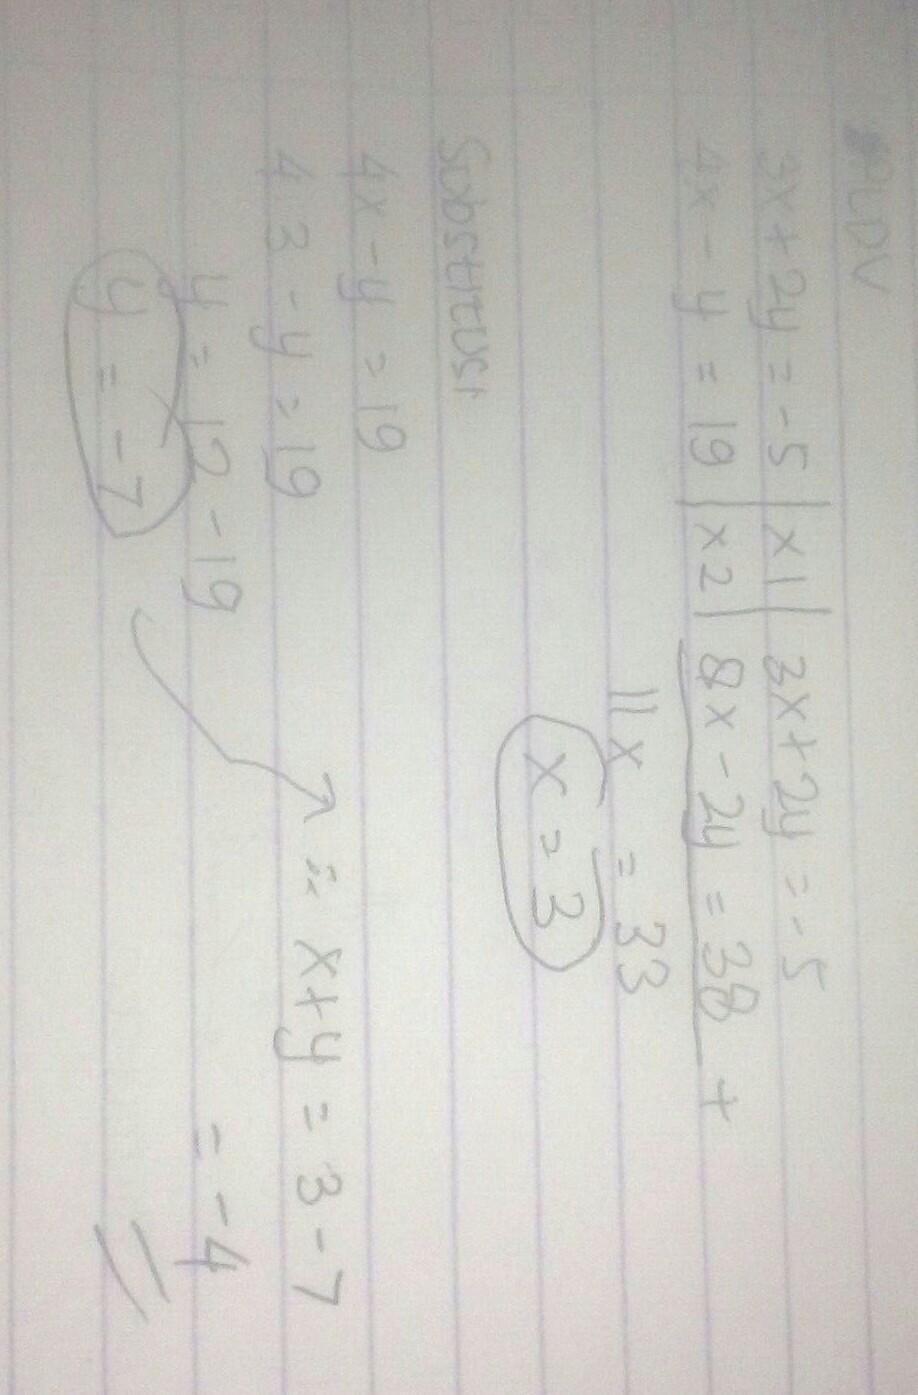 Diketahui spldv 3x +2y= -5 dan 4x - y=19.nilai x + y yang ...